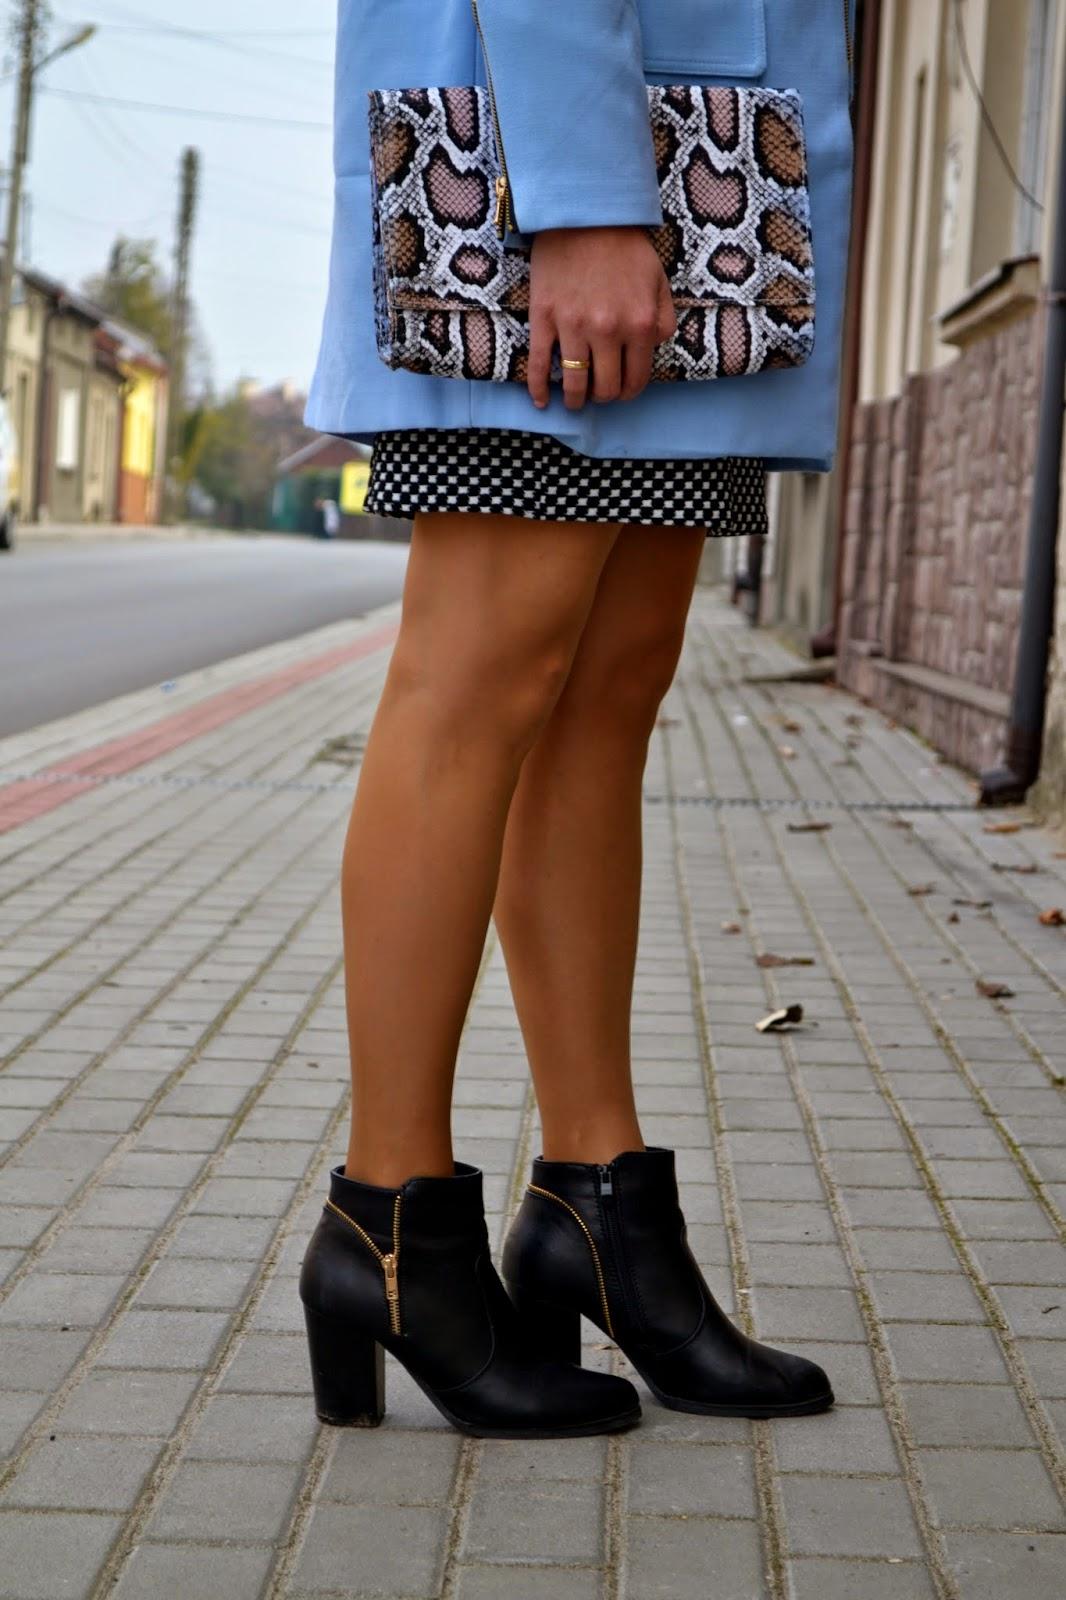 kopertówka pantera, panterkowa torebka, botki z zamkiem, botki na słupki, czarne botki